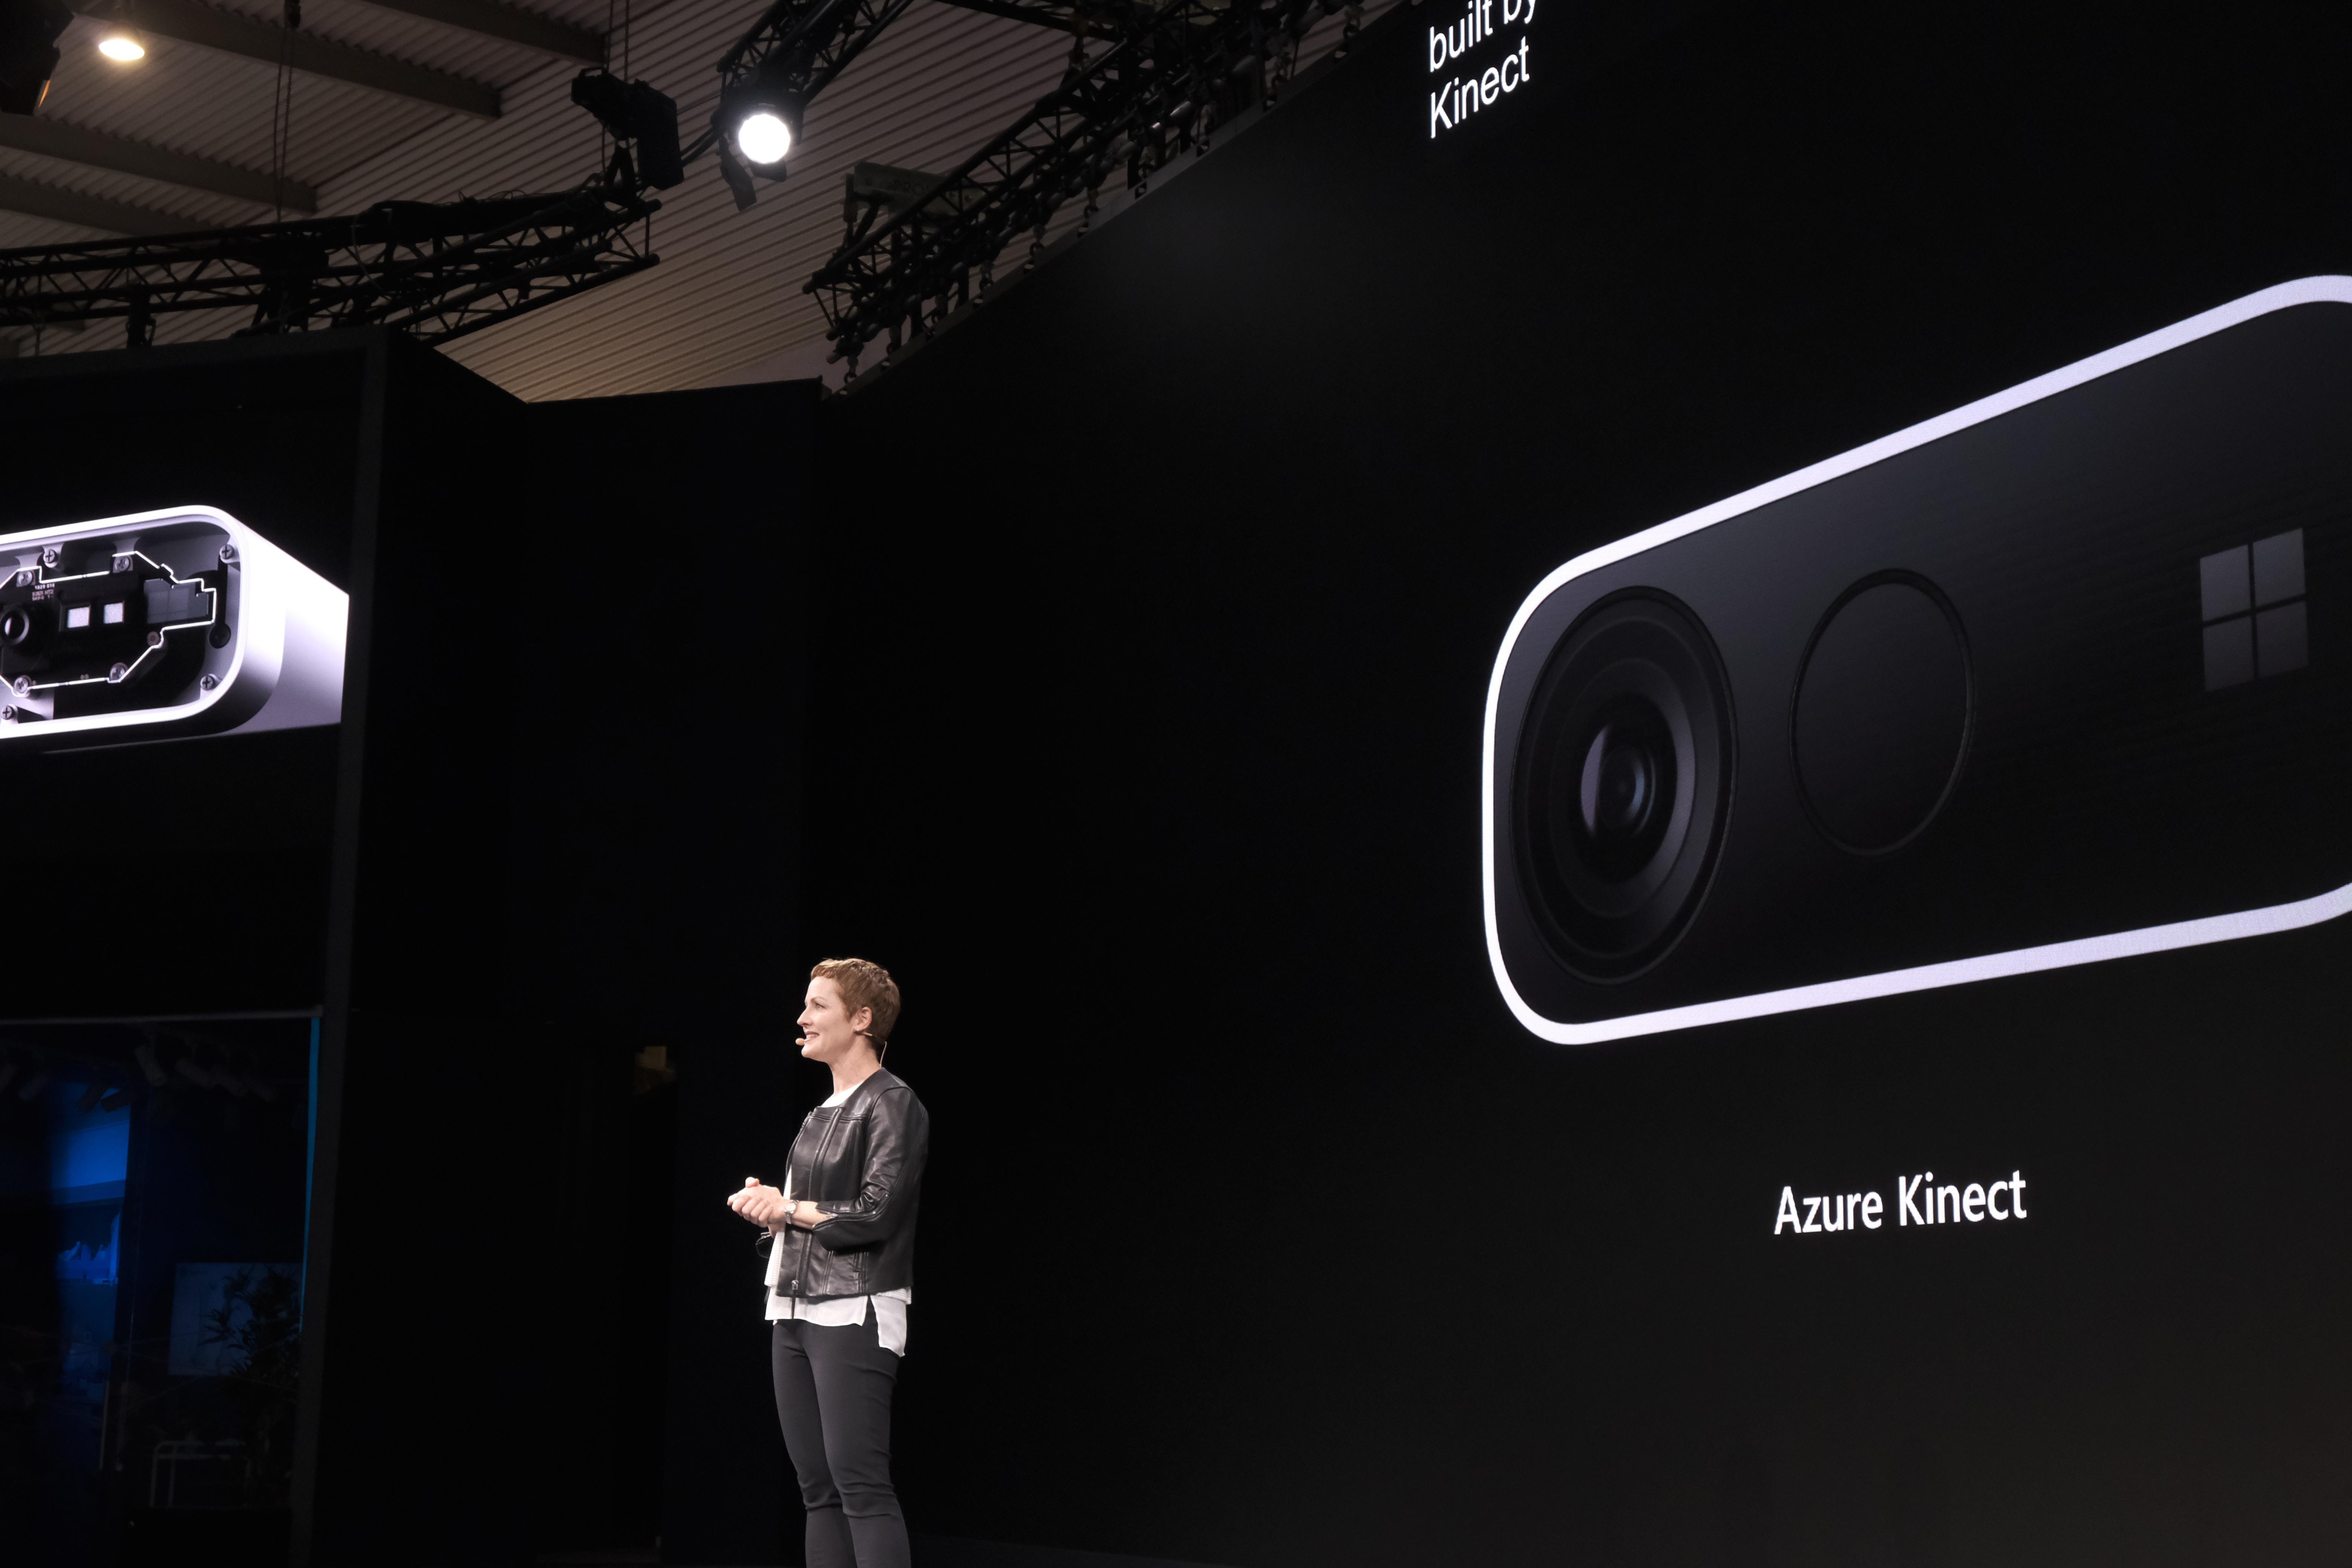 Microsoft announces an Azure-powered Kinect camera for enterprise